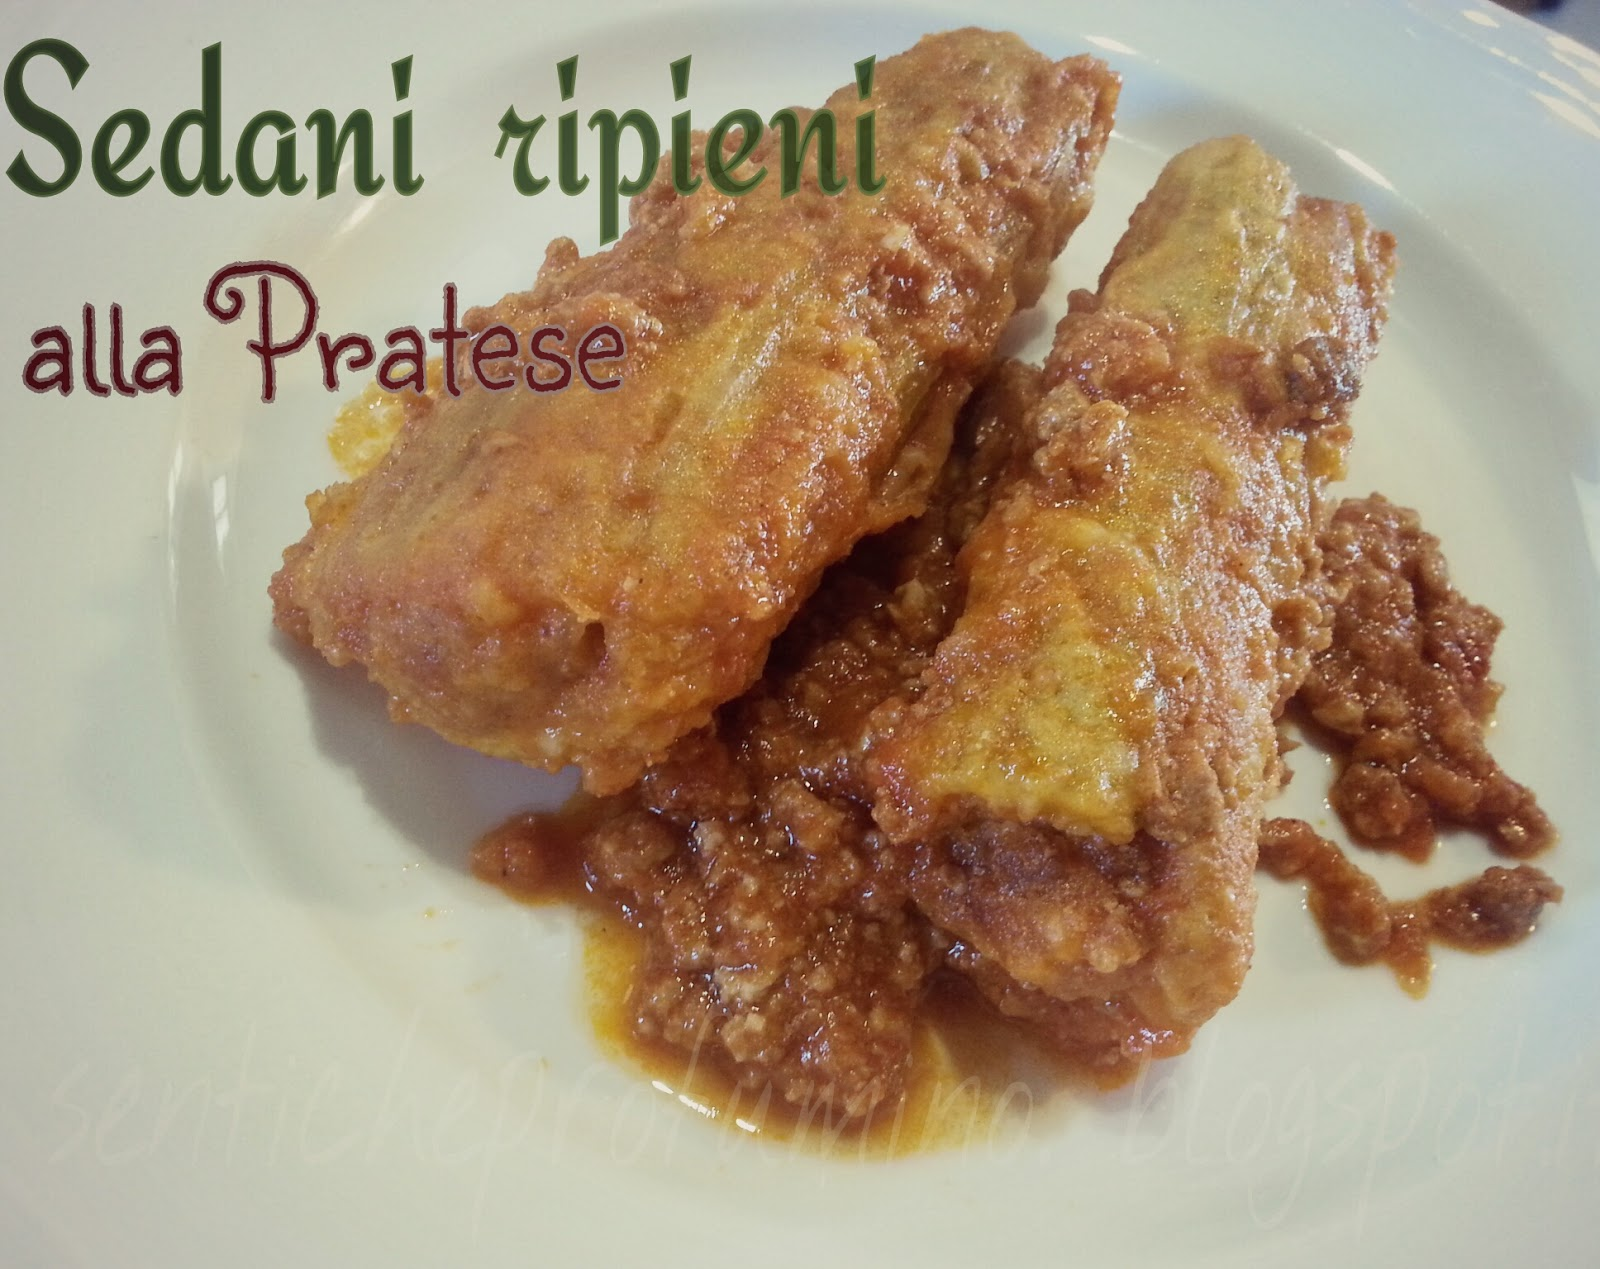 Sedani ripieni alla Pratese, Cucina Toscana